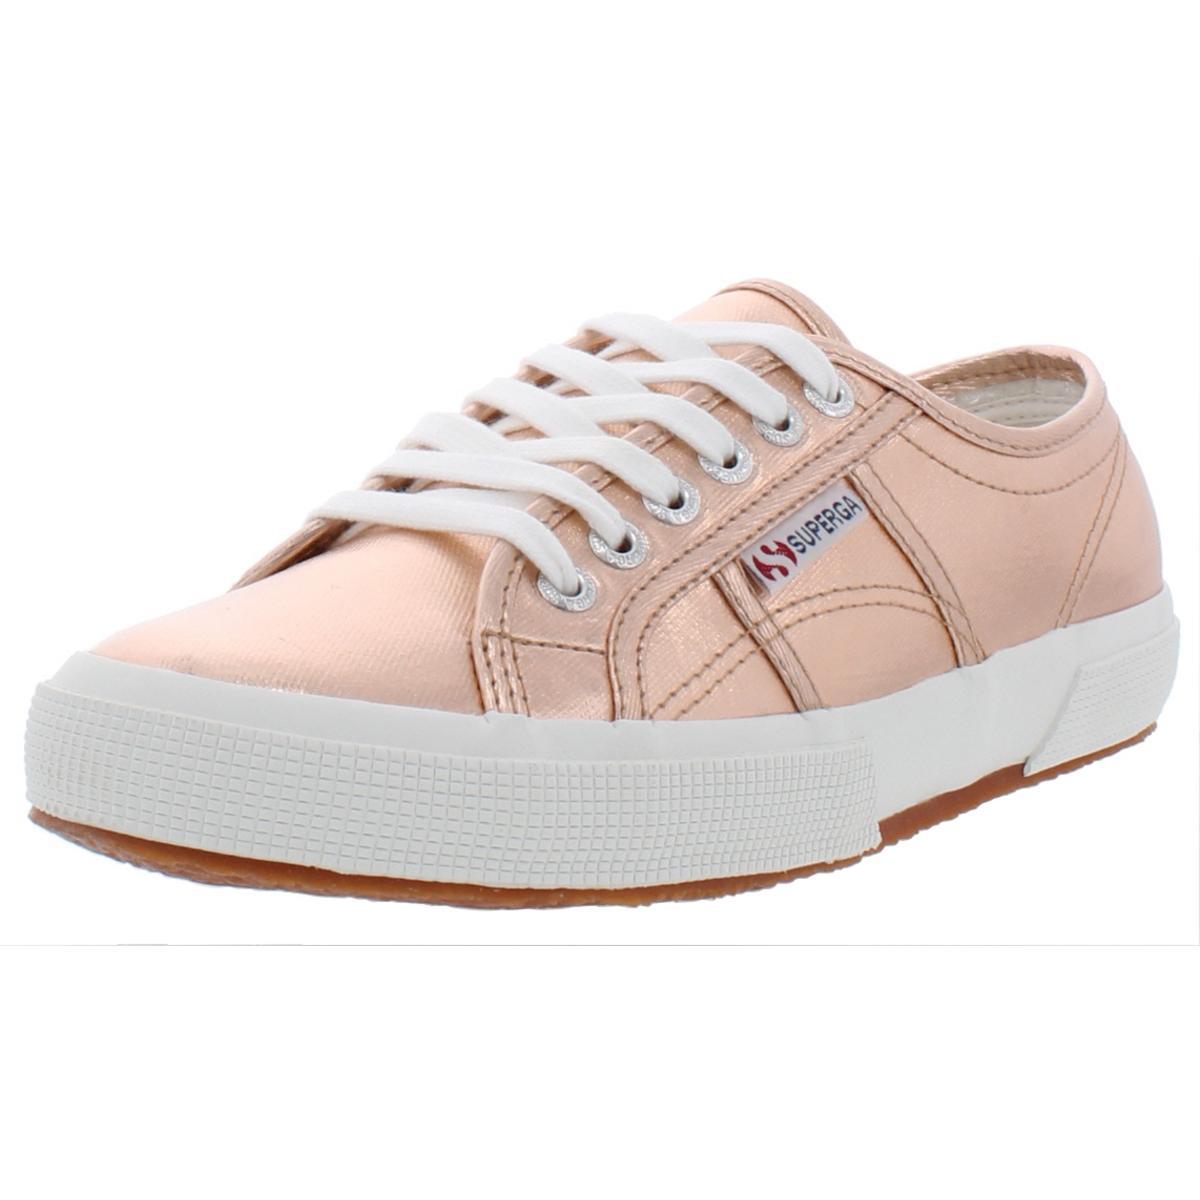 Superga Womens 2750 Nylon Low-Top Skate Sneakers Shoes BHFO 0321